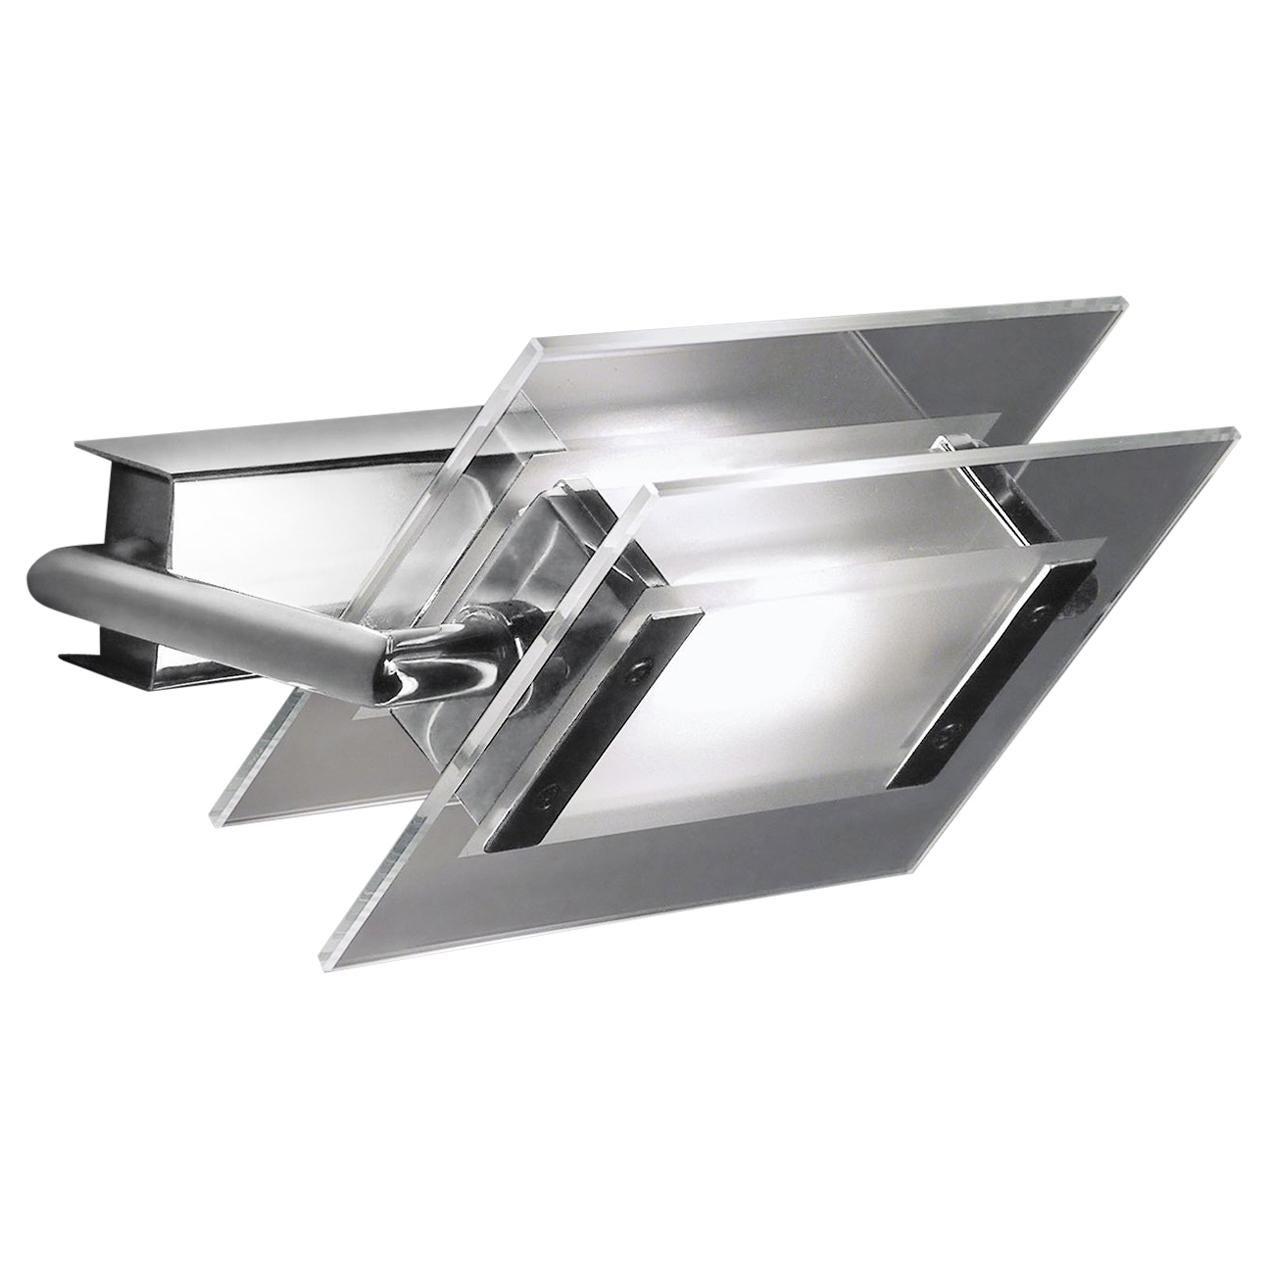 Leucos 360° P-PL 200 LED Wall Light in Satin, Transparent & Chrome by Design Lab